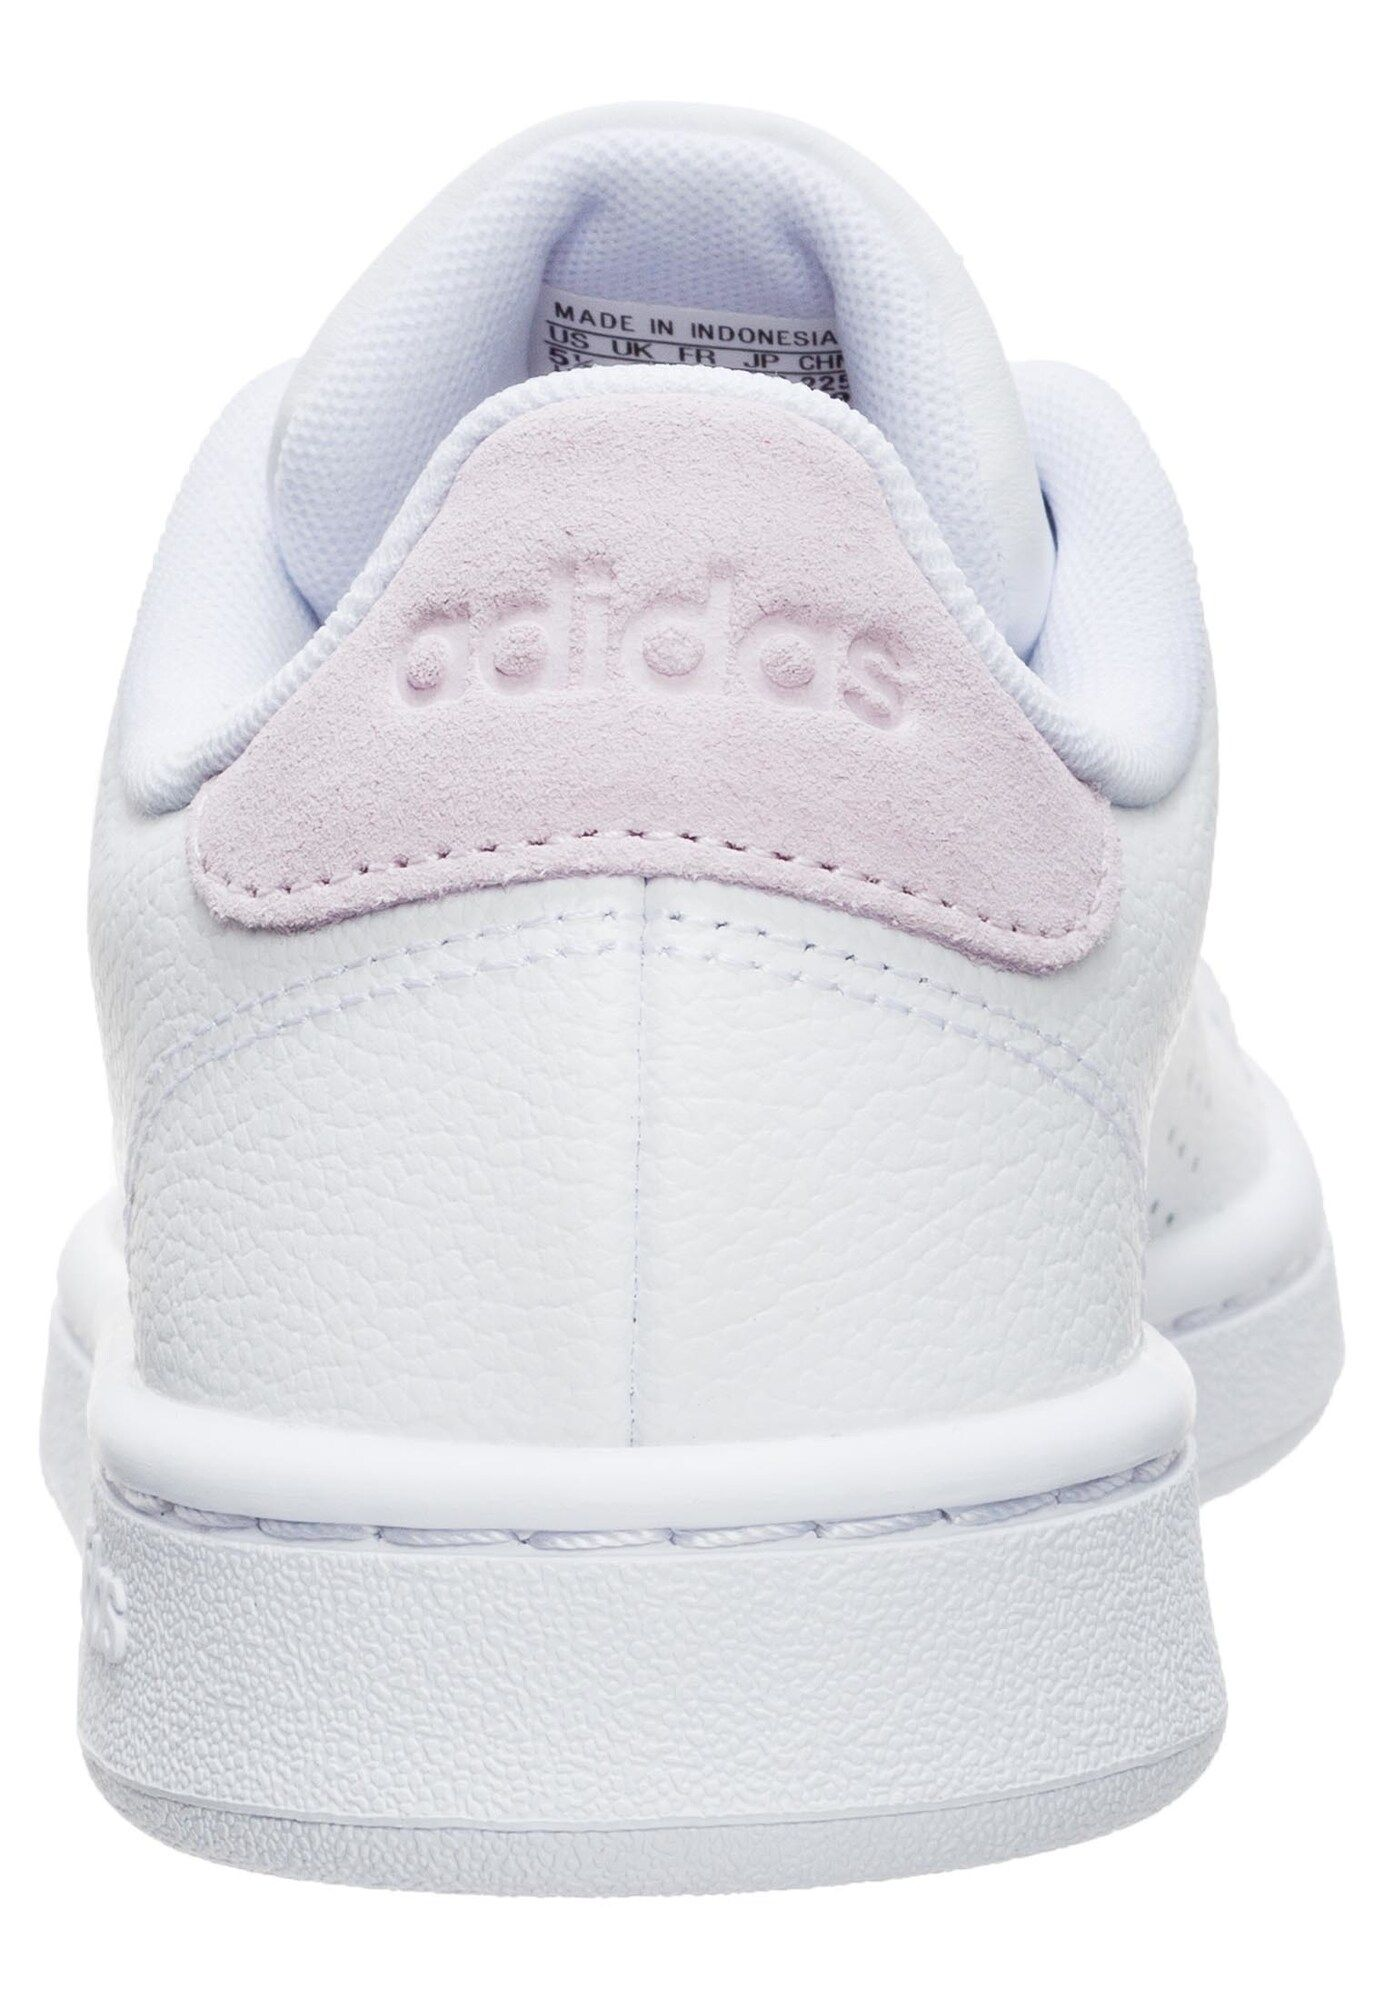 ADIDAS PERFORMANCE Sneaker 'Advantage' Damen, Rosa / Weiß ...